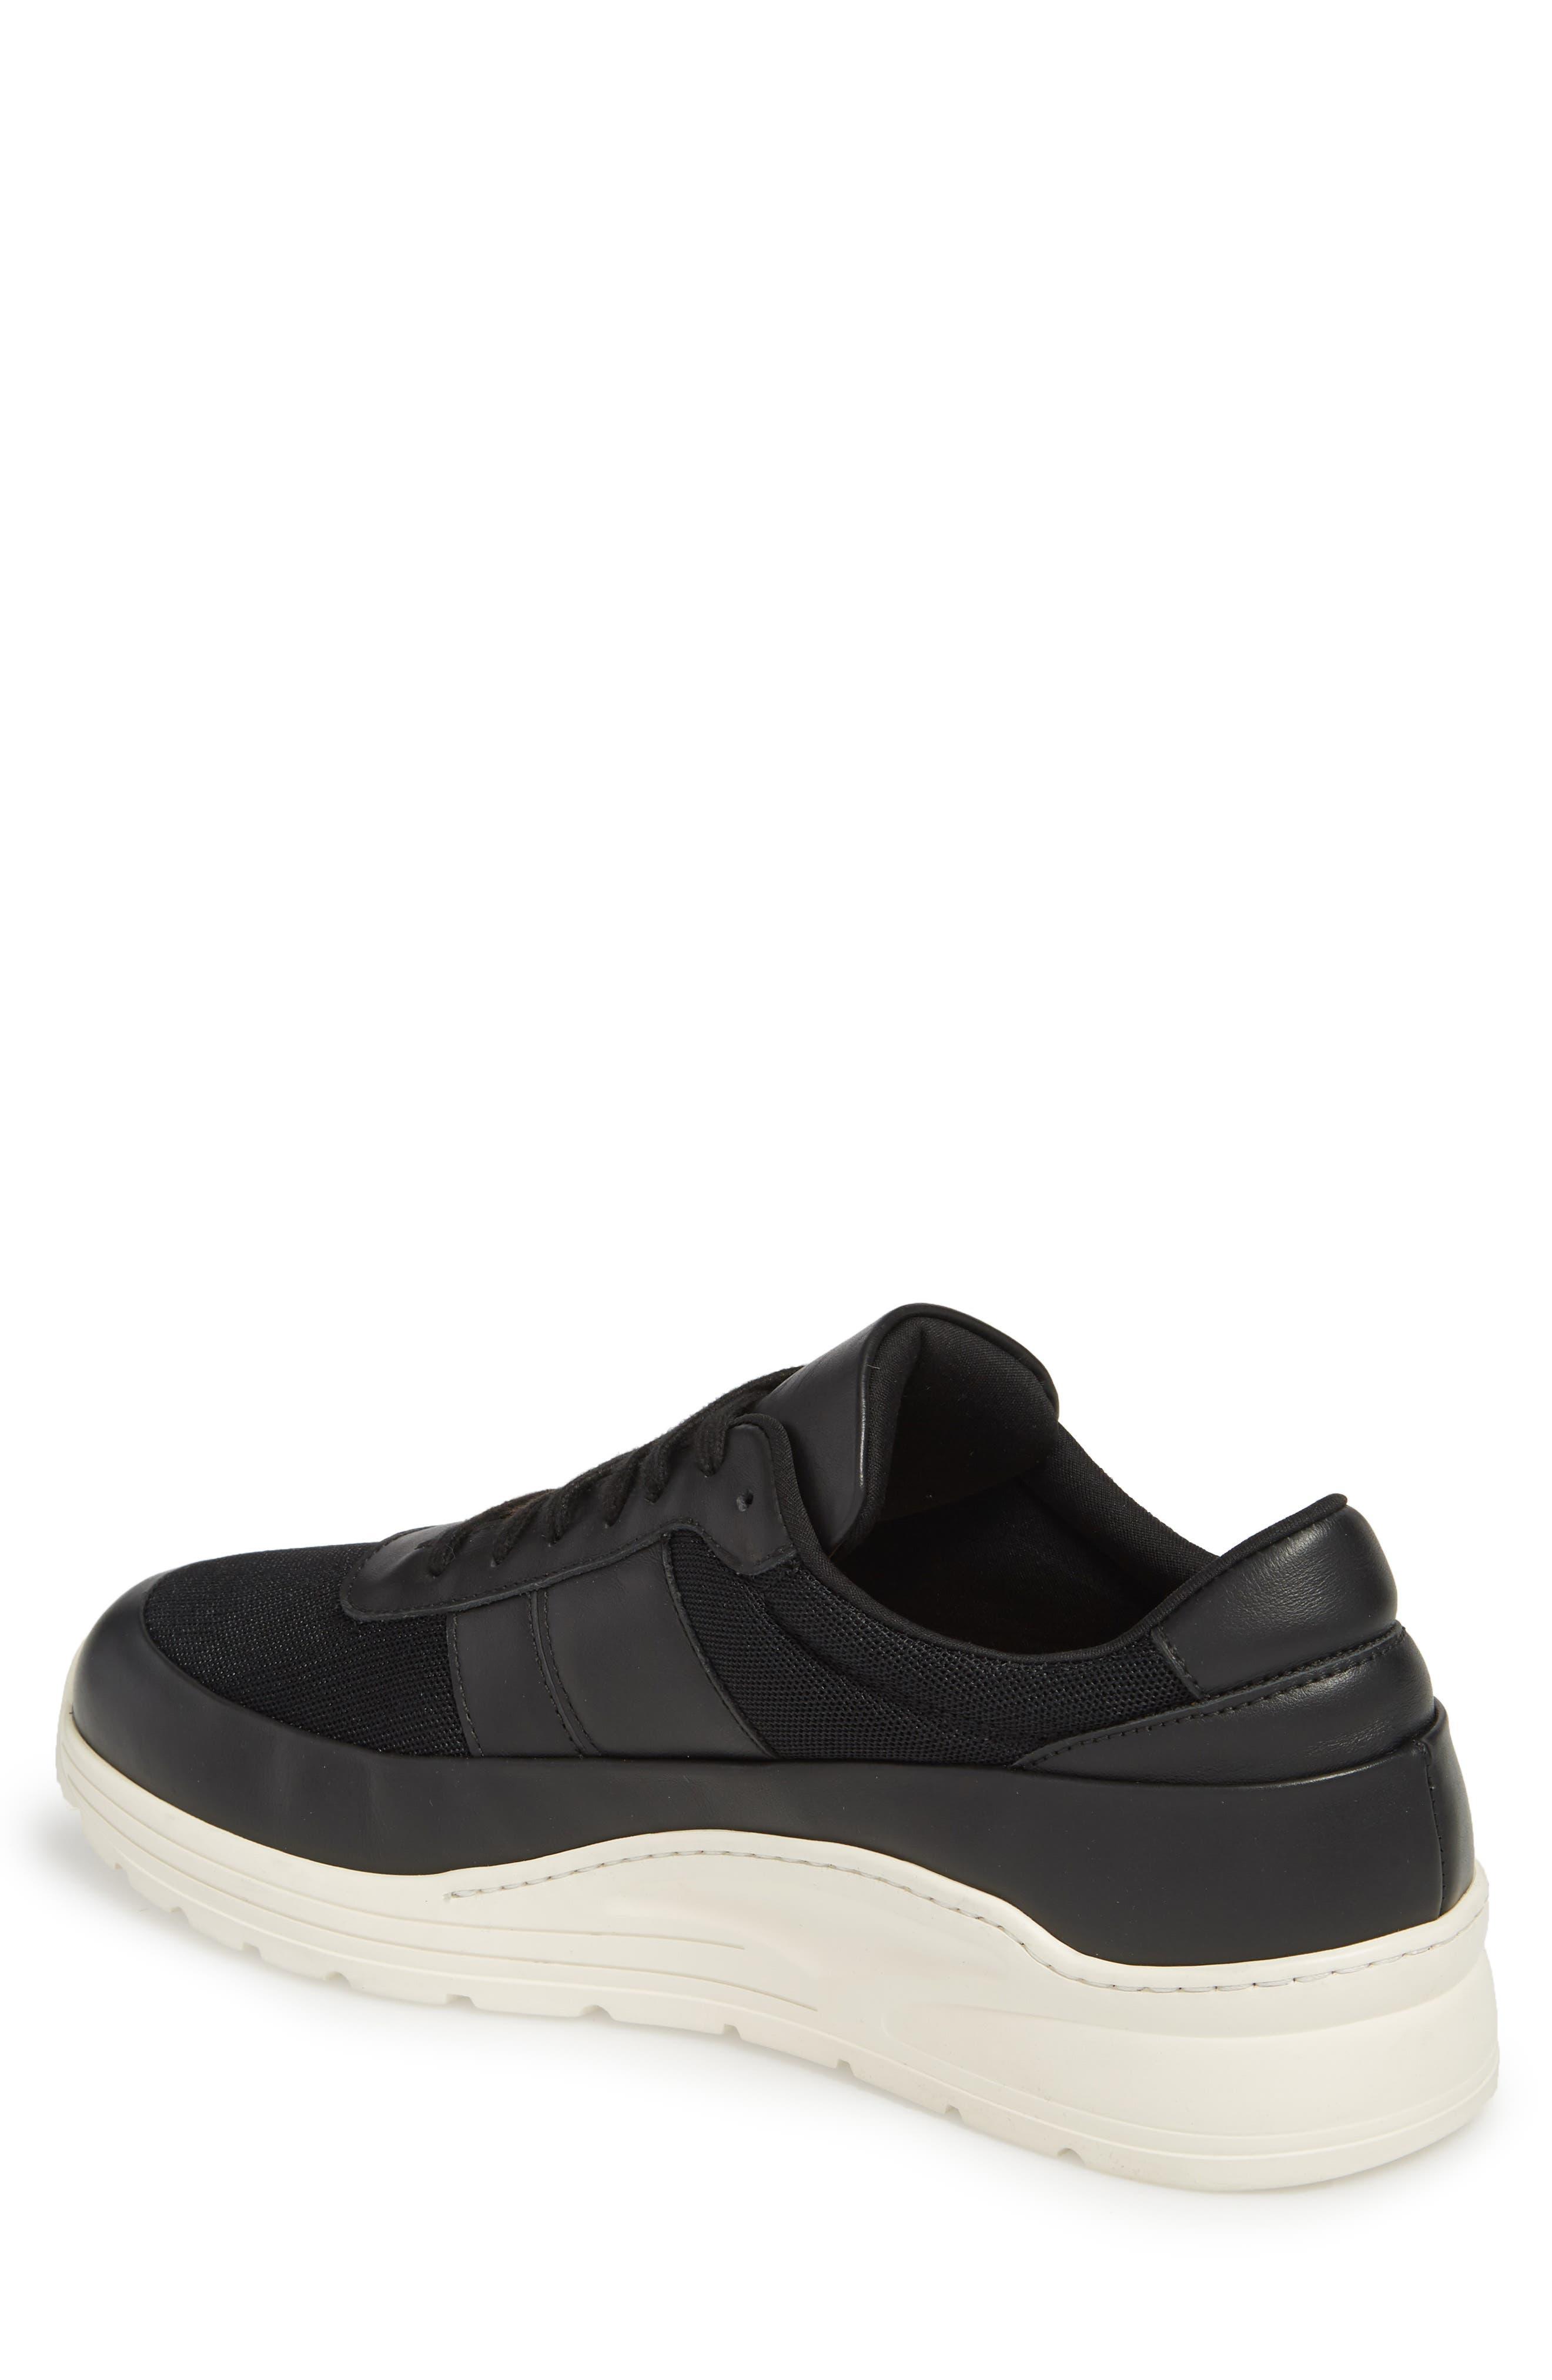 Track Super Low Top Sneaker,                             Alternate thumbnail 2, color,                             001